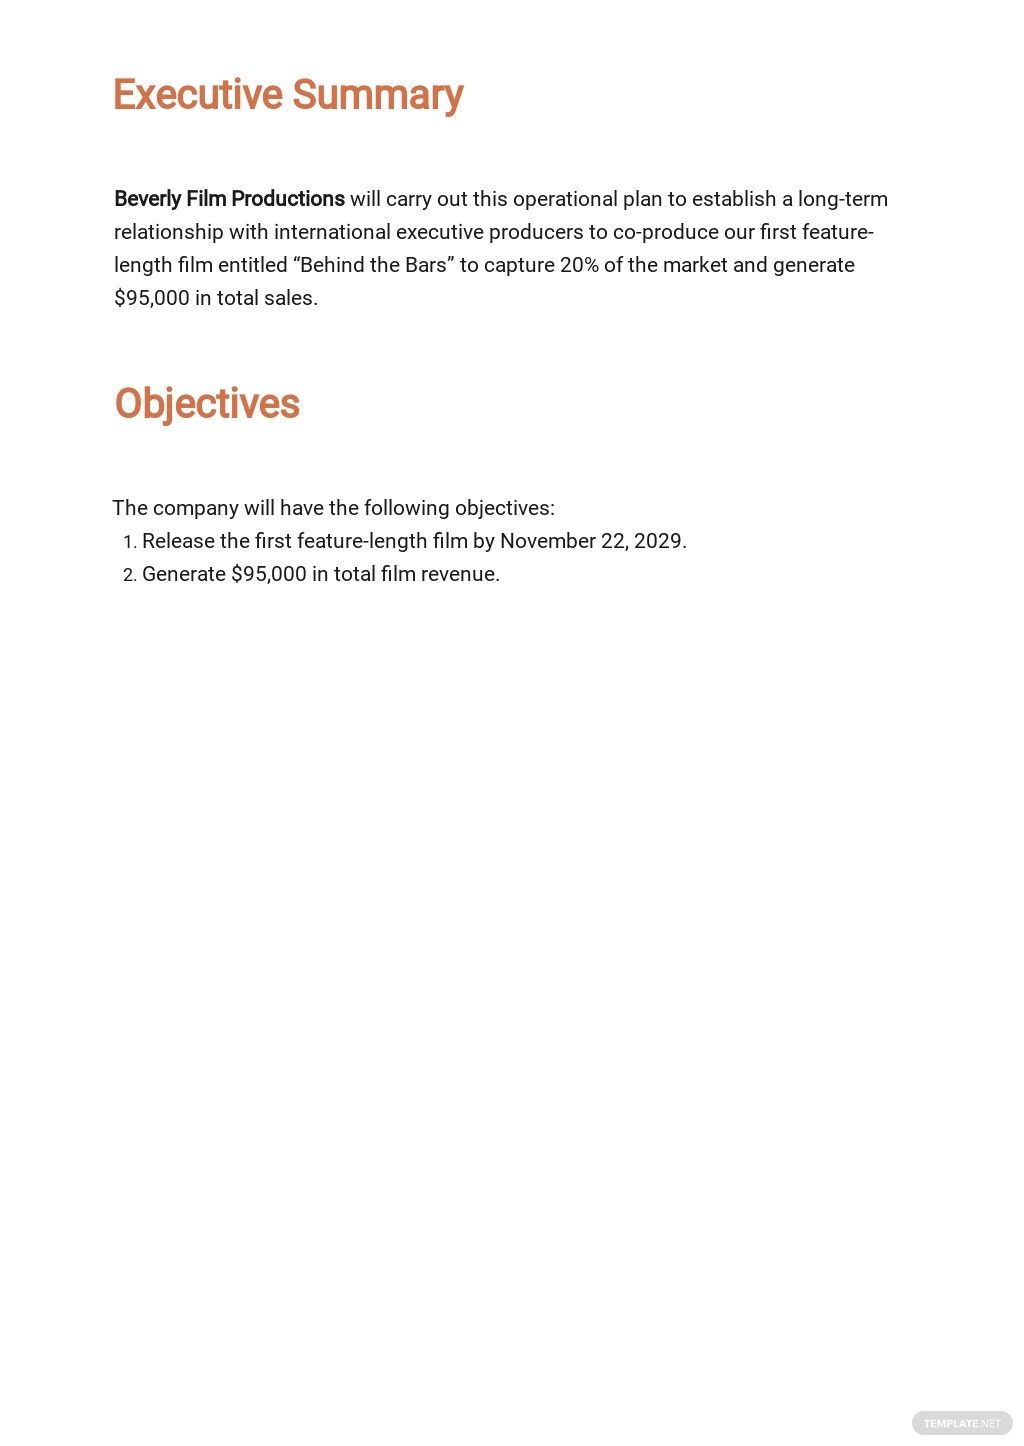 Startup Operational Plan Template [Free PDF] - Google Docs, Word, PDF